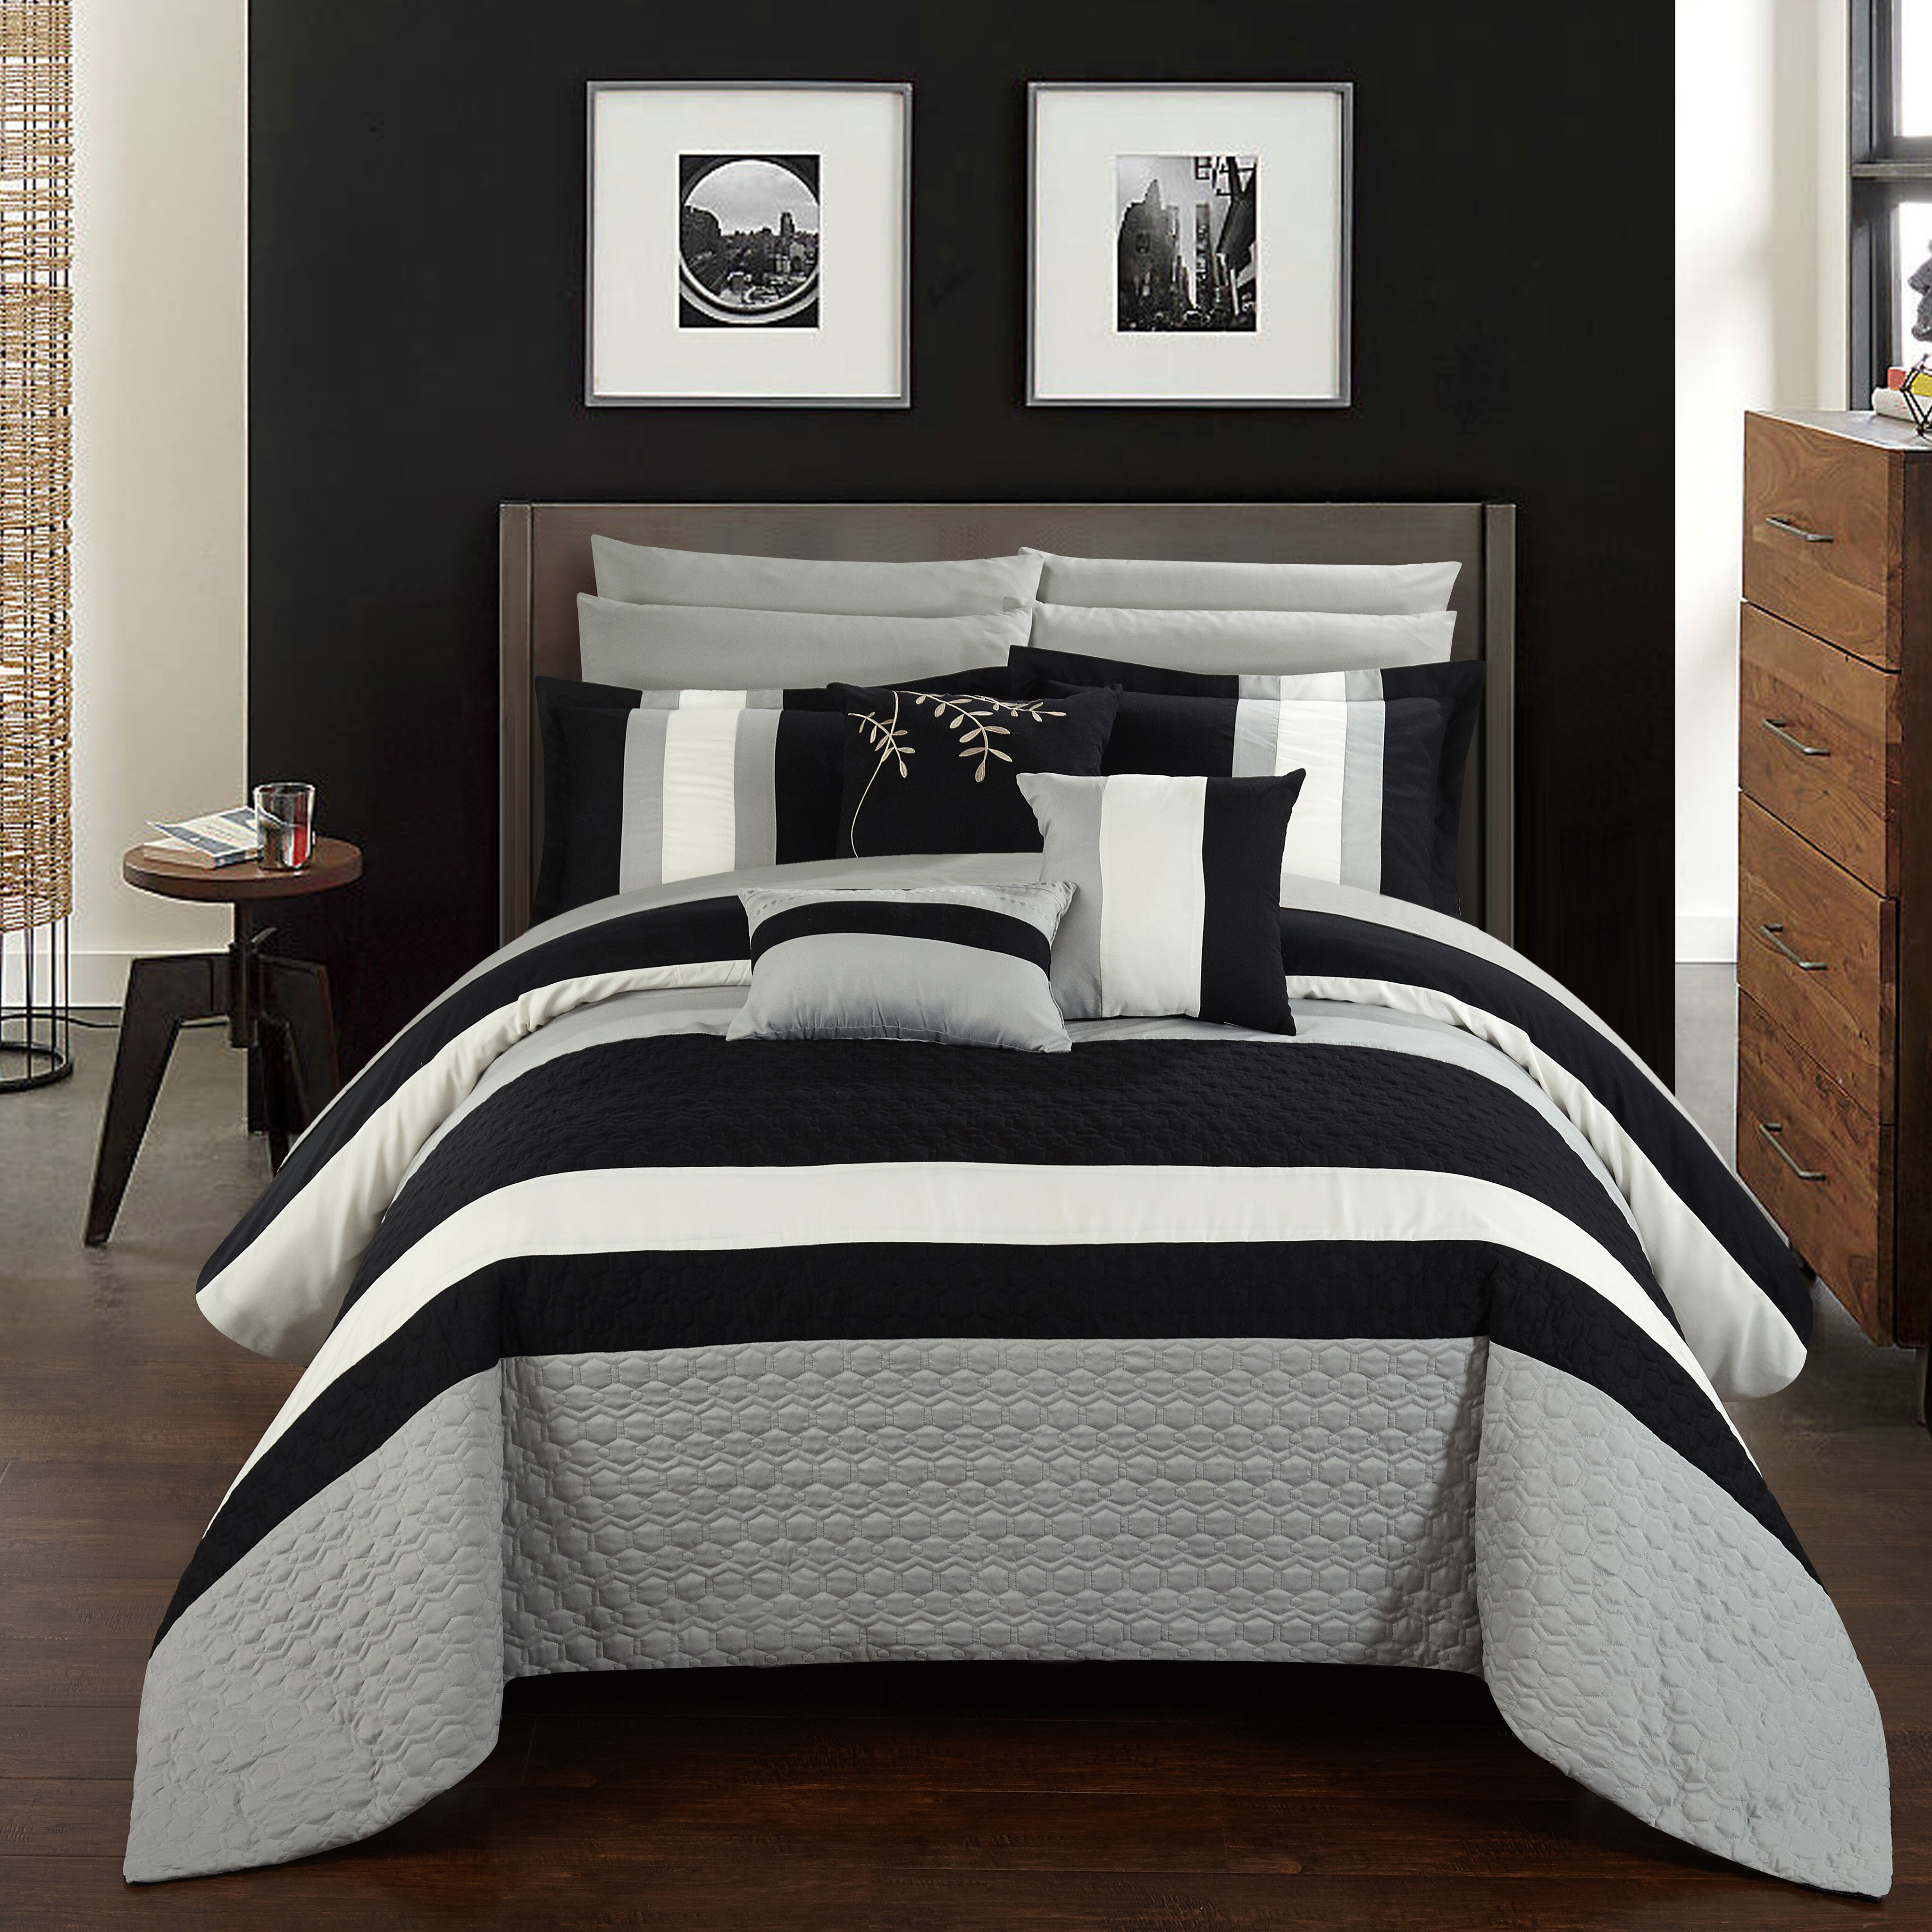 bed bath bedding queen bedding sets chic home sku chde2649